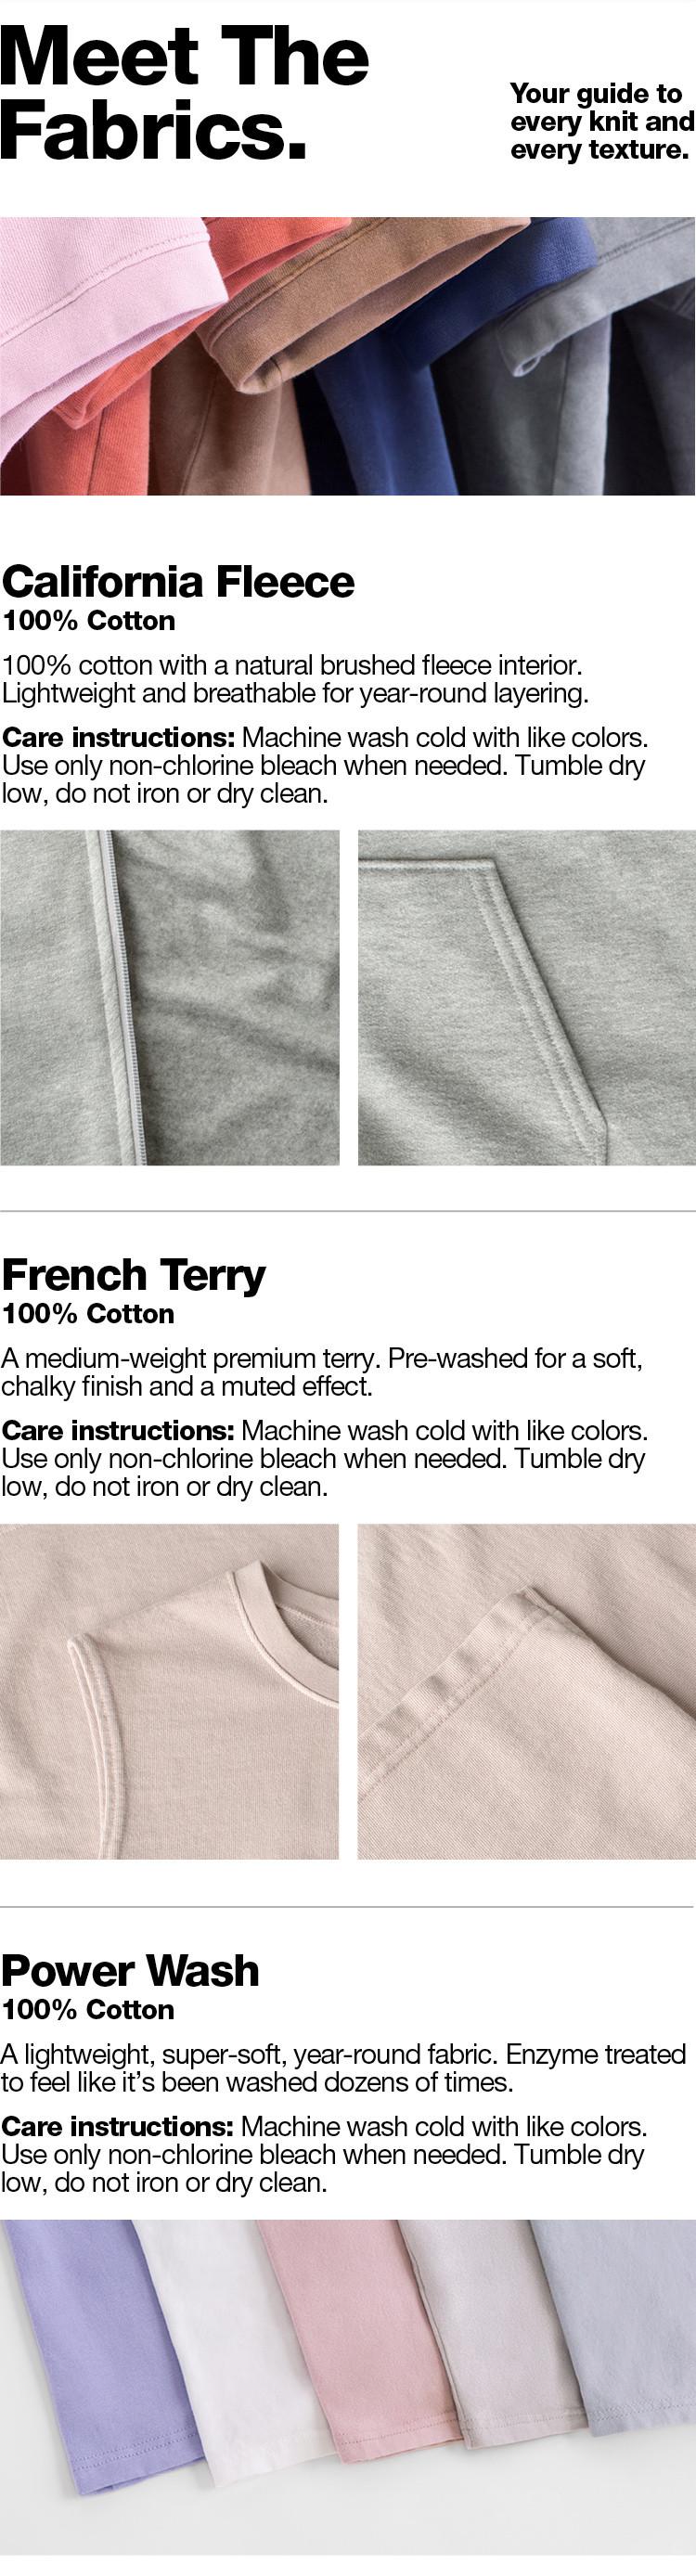 Meet the Fabrics - 1